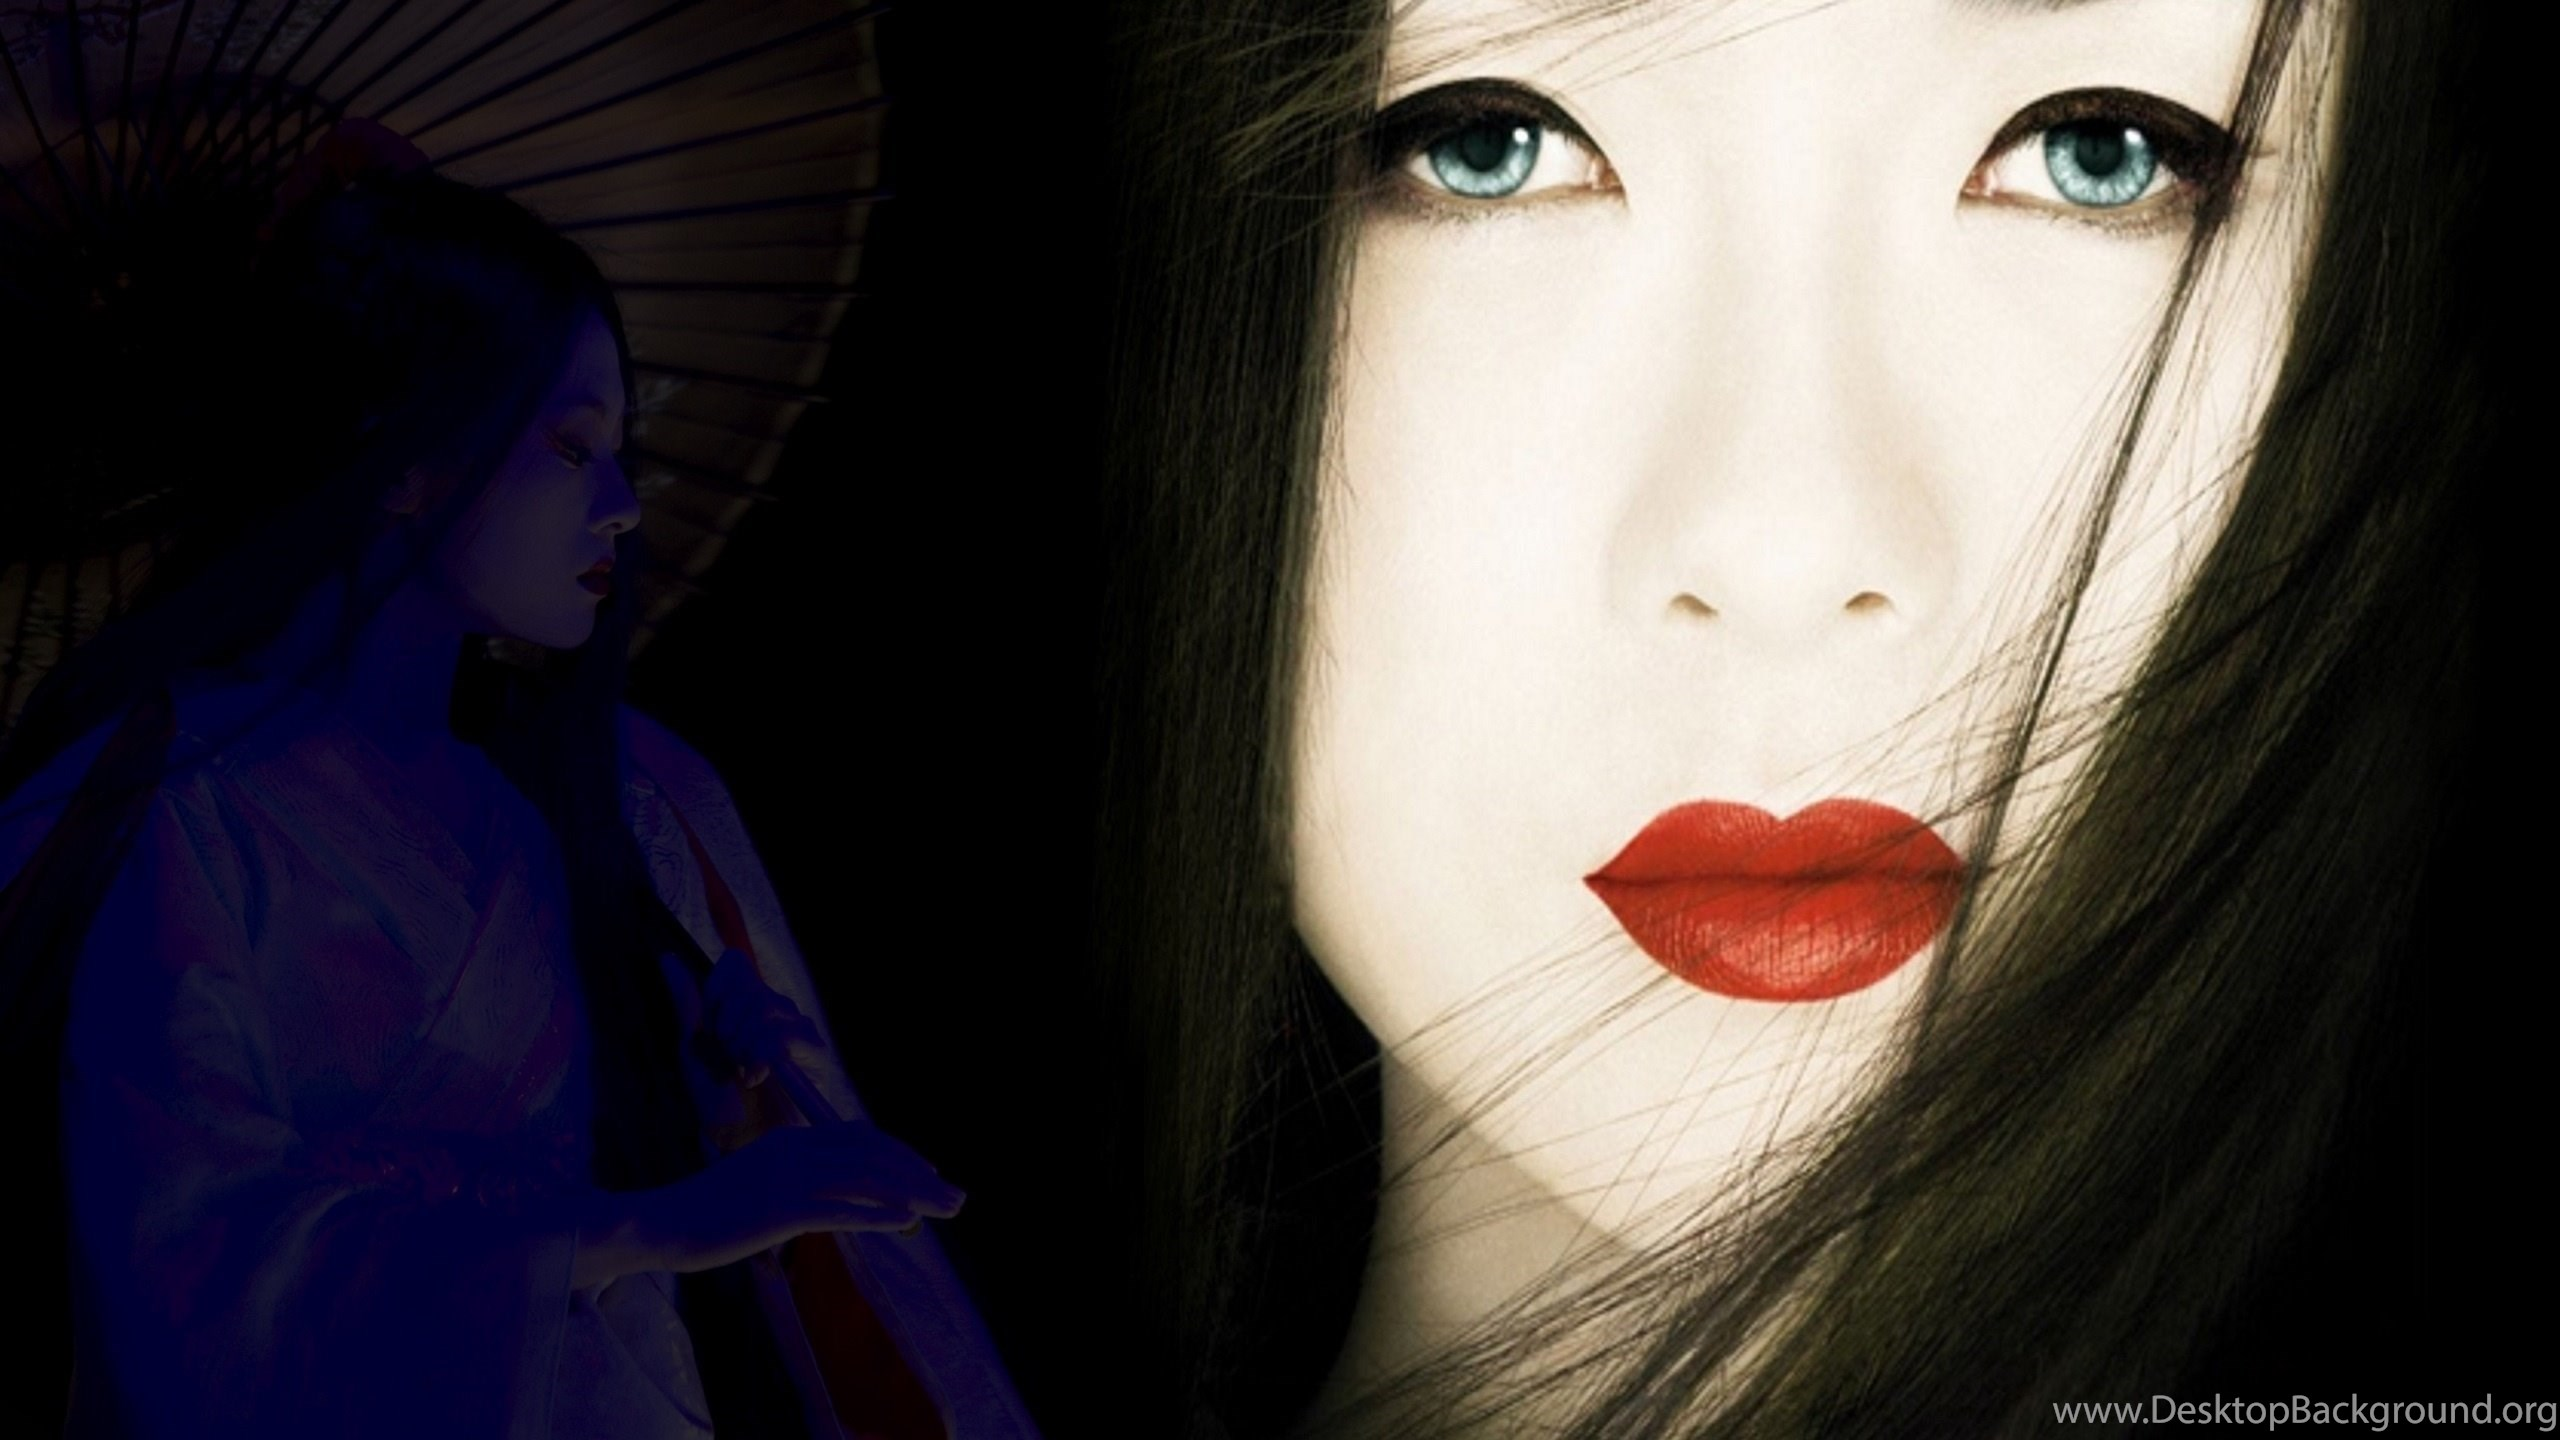 https://www.desktopbackground.org/download/2560x1440/2013/03/02/538849_2560x1600-geisha-woman-red-lips-japan-beauty-beauty-geisha_2560x1600_h.jpg